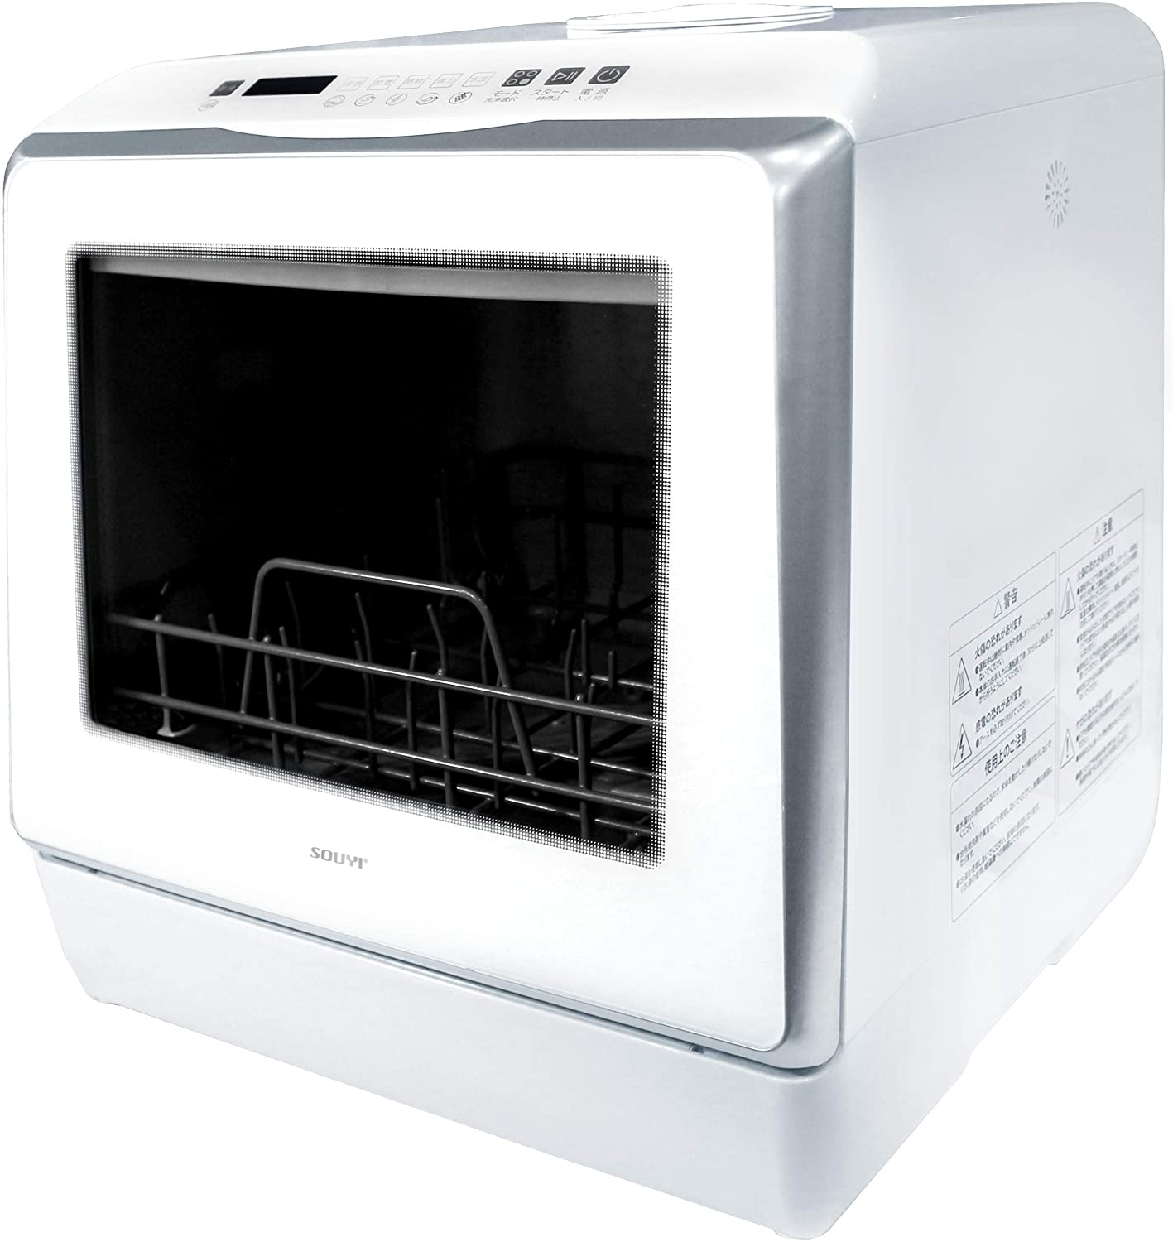 SOUYI(ソウイ) 食器洗い乾燥機 SY-118の商品画像